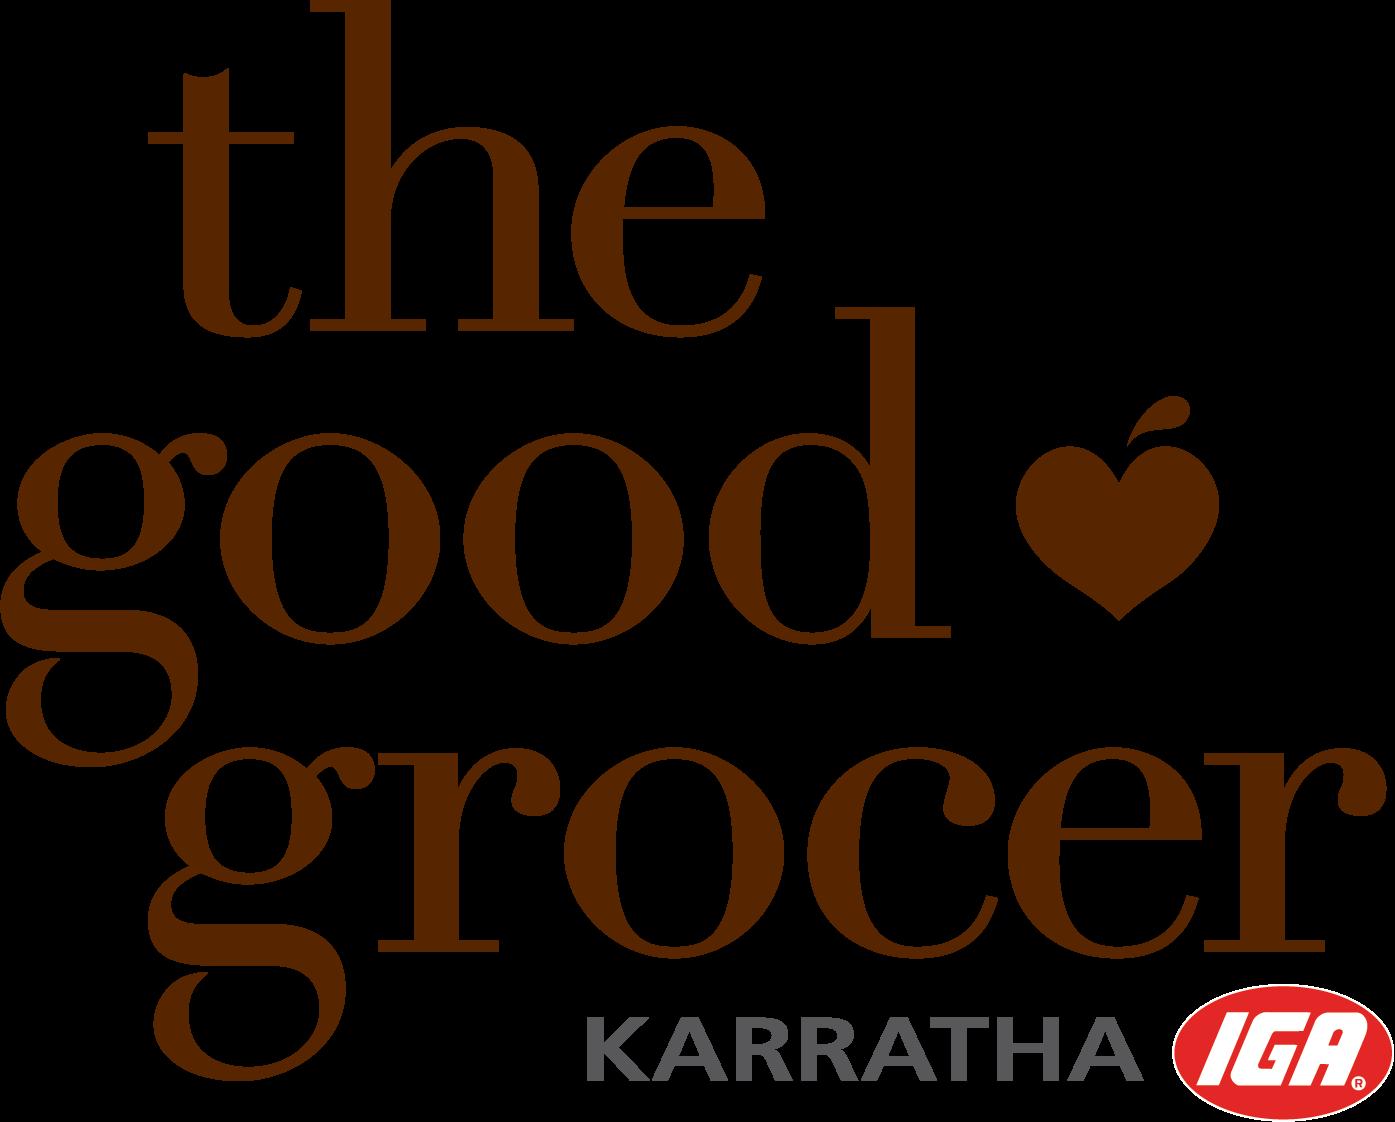 The Good Grocer - Karratha